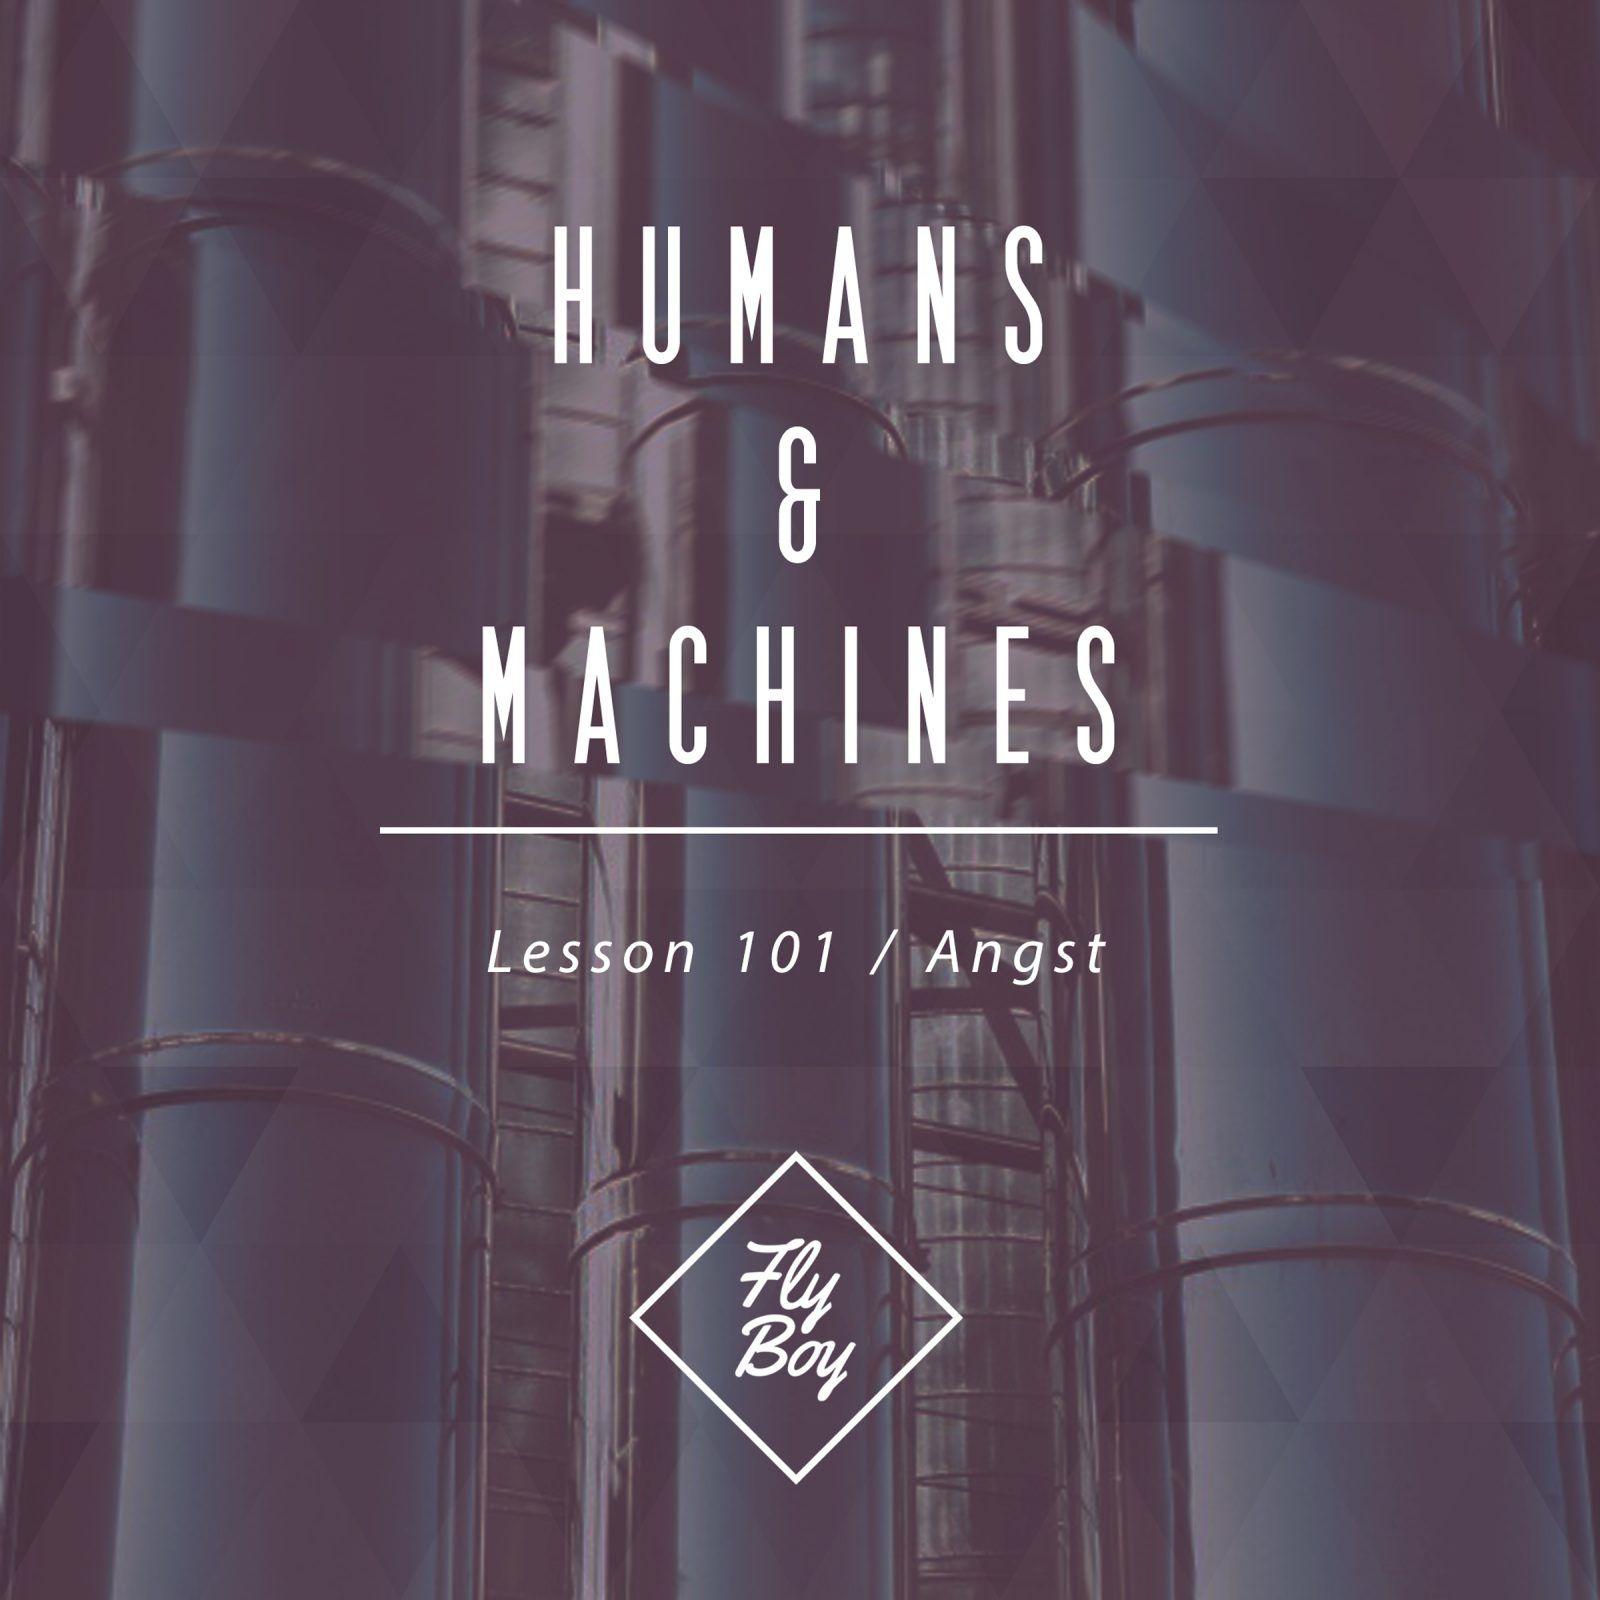 humansmachines-lesson101-angst-flyboyrecords.jpg